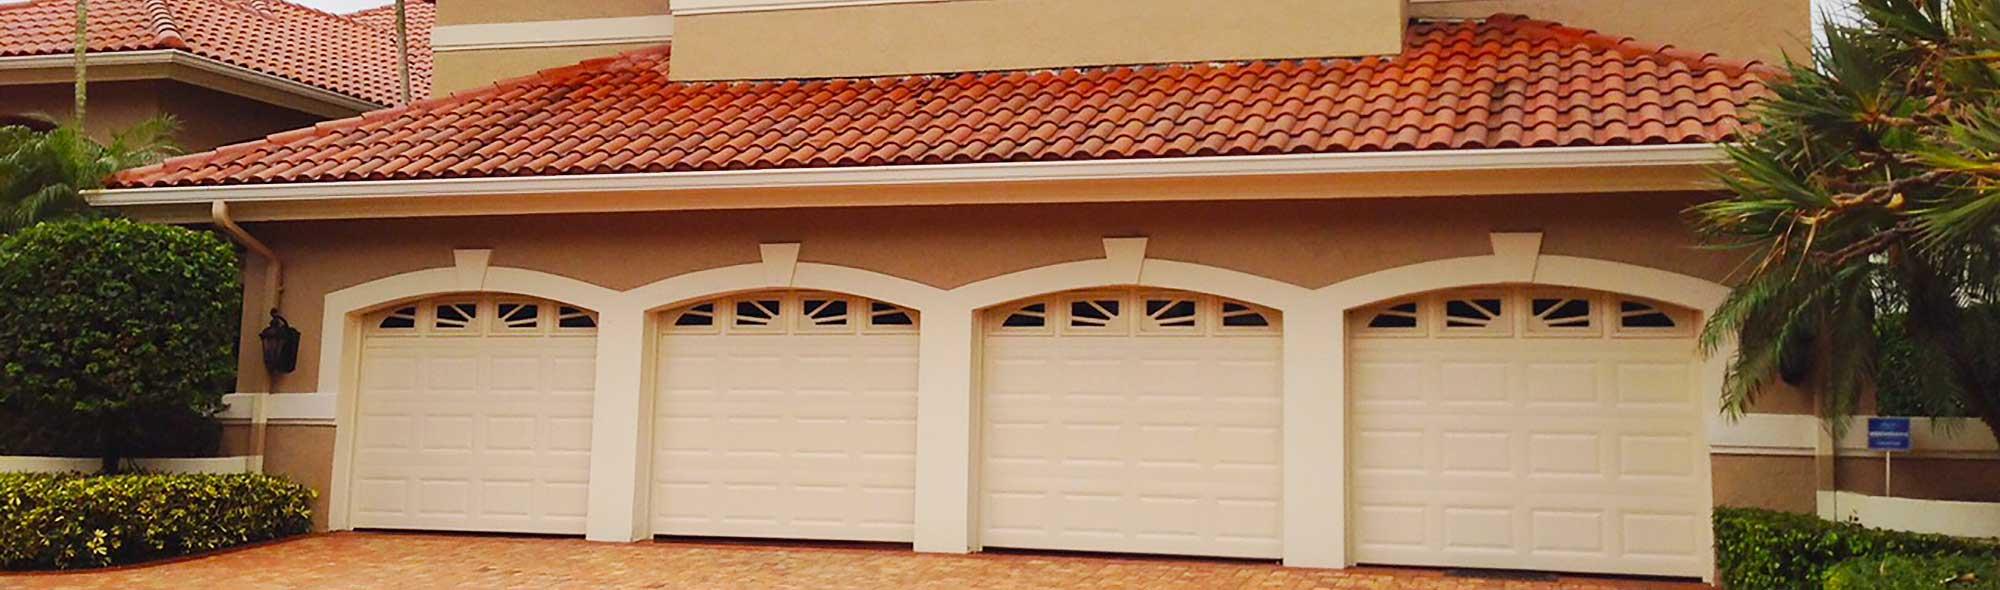 Garage door installation repair service near boca raton for Fort lauderdale garage door repair